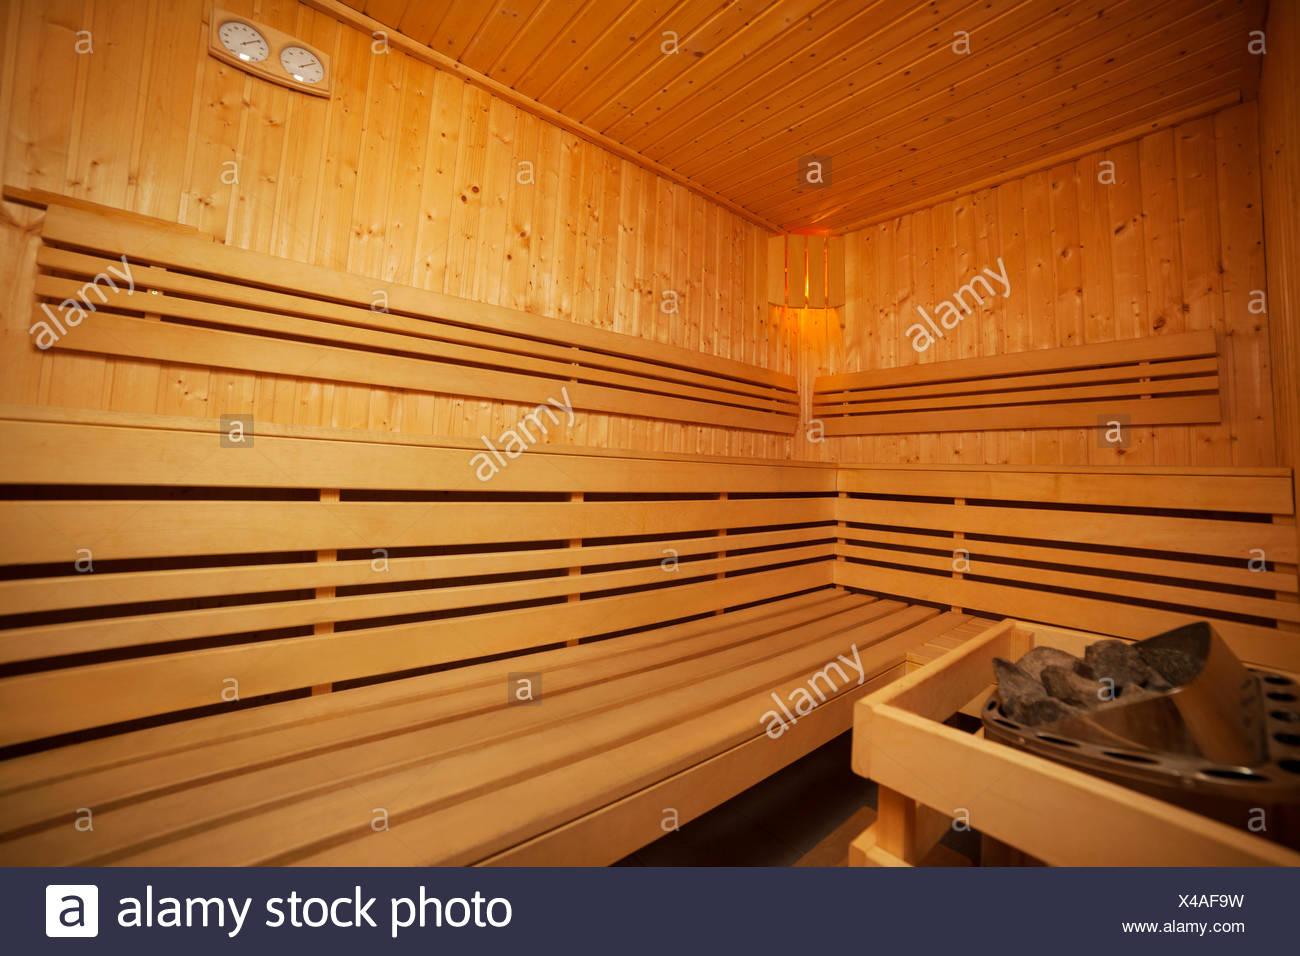 Interior of wooden sauna bath Debica, Poland - Stock Image